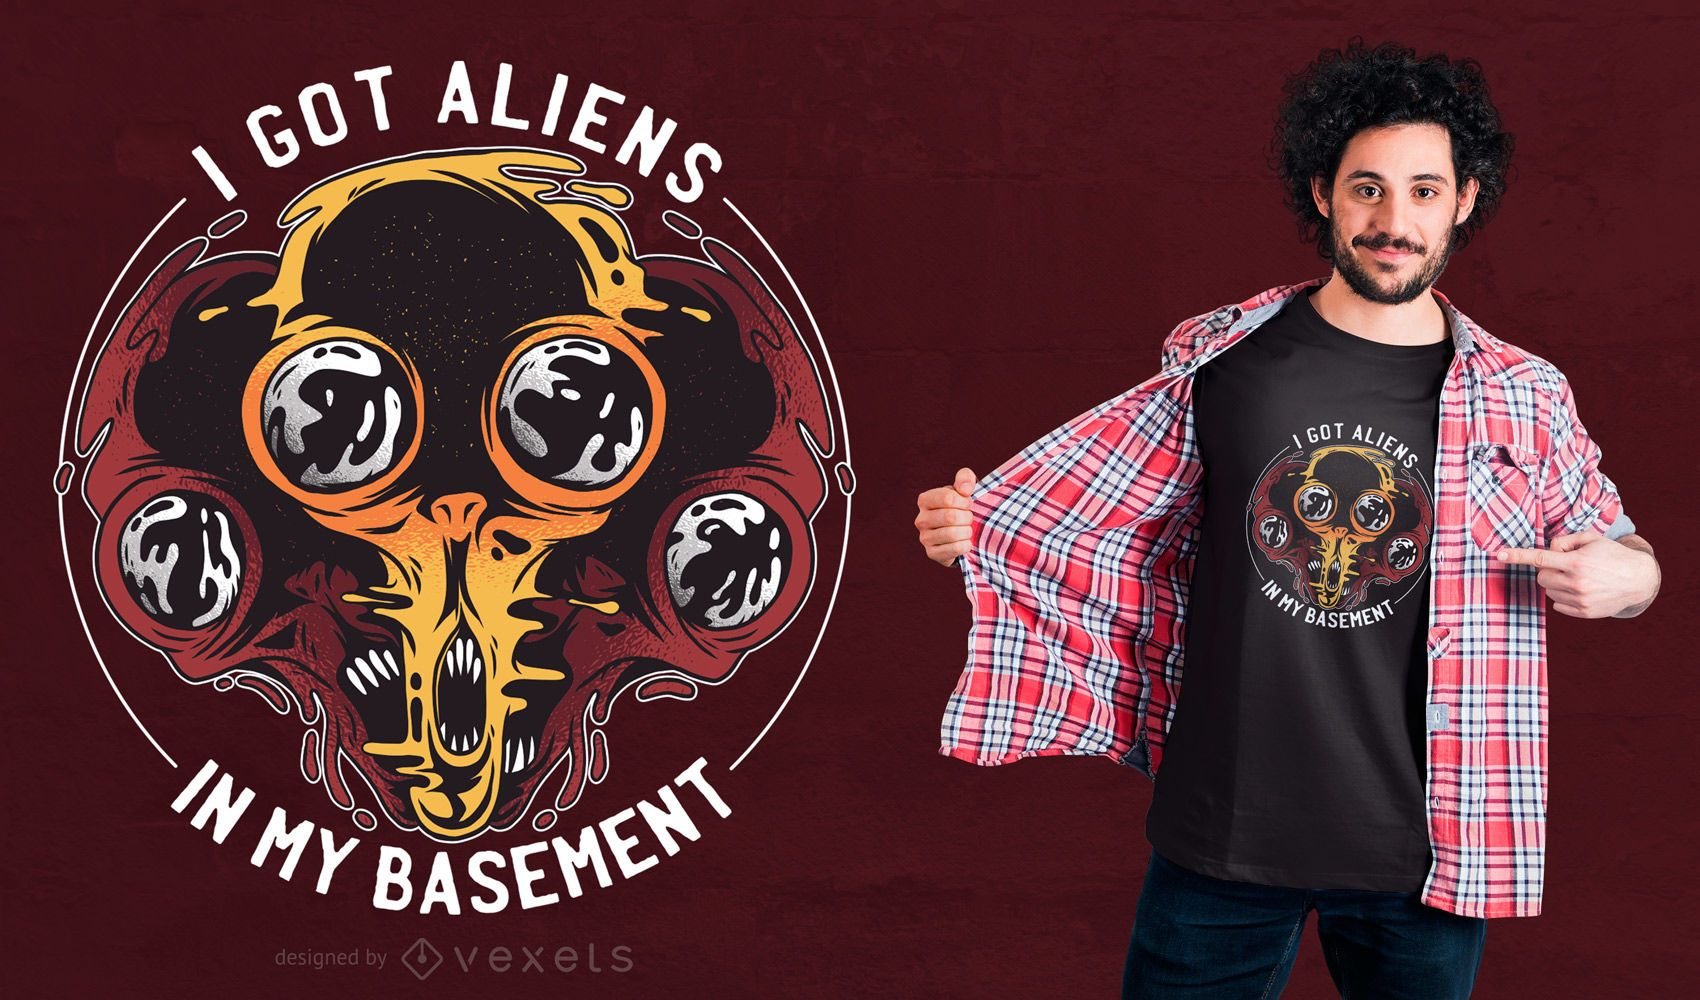 Aliens in basement t-shirt design